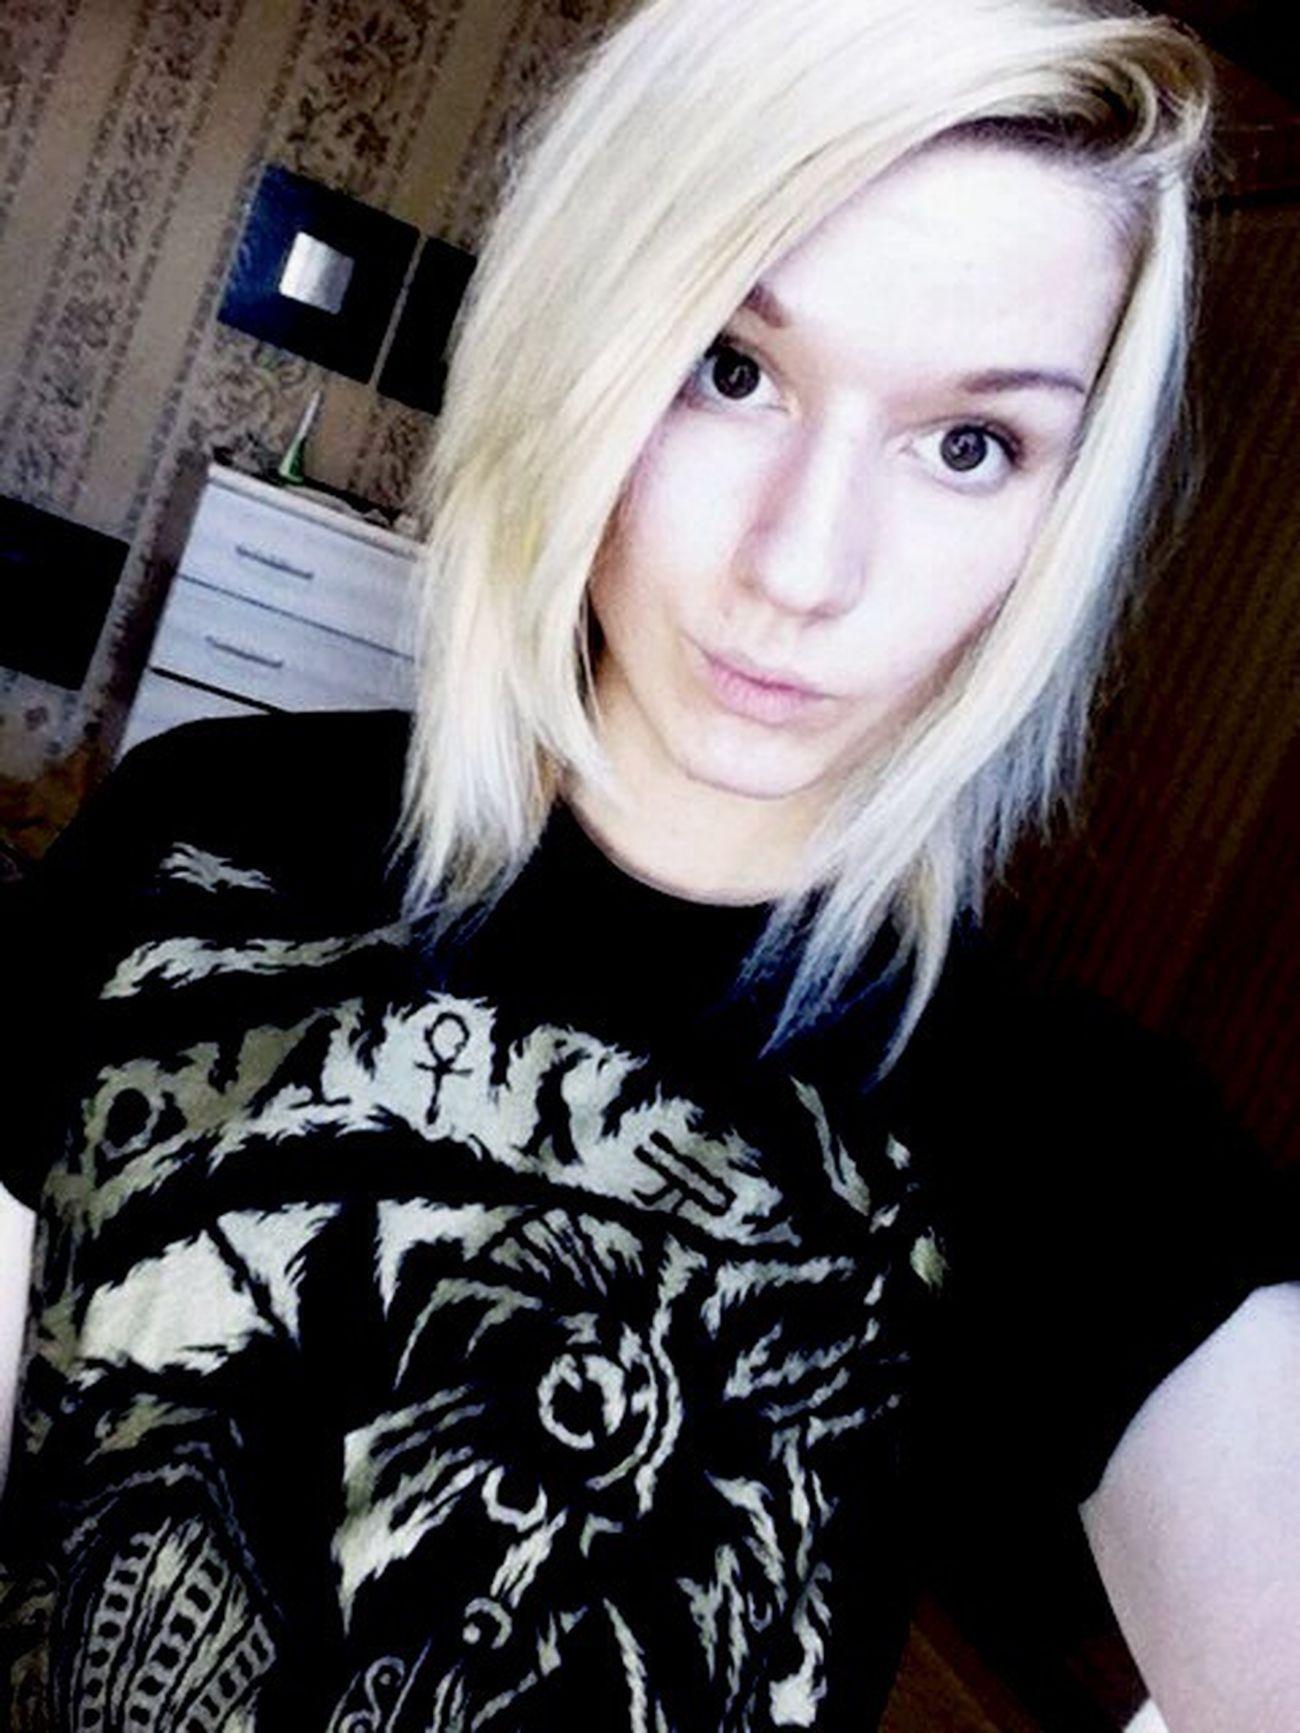 Me Stupid Girl Selfie Cute Meow Blond Hair Pretty